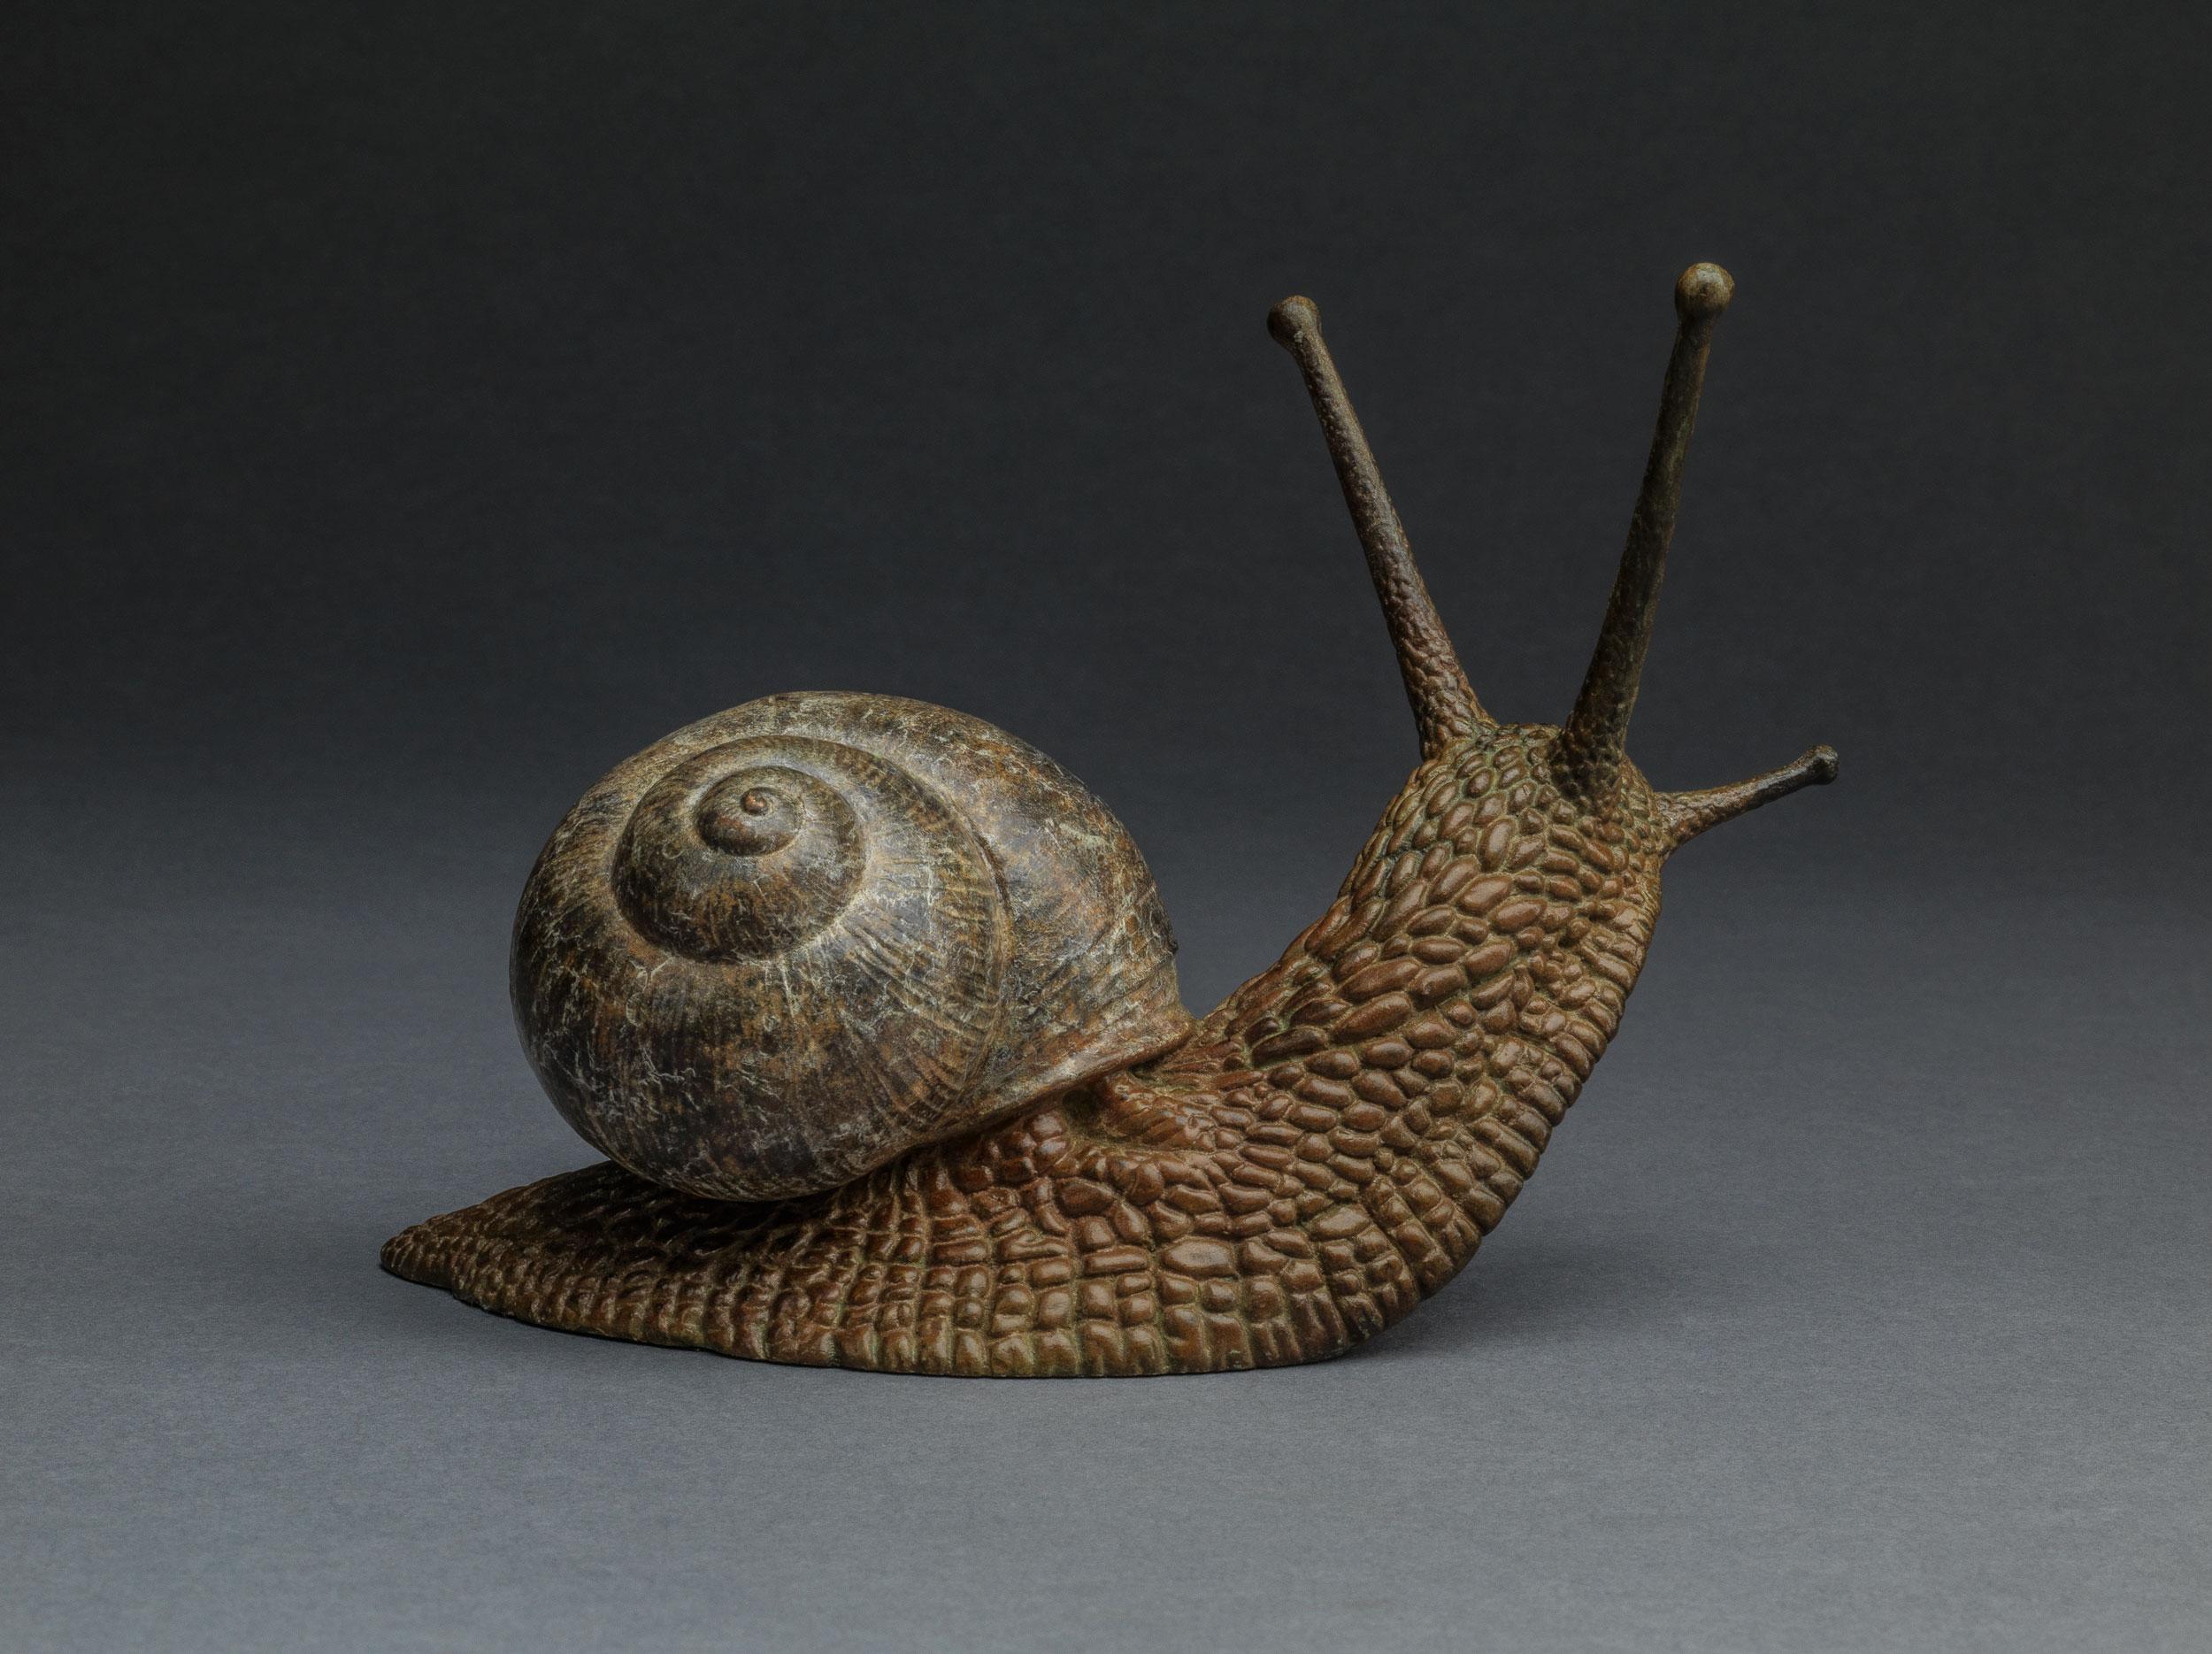 14. Garden Snail by Nick Bibby, Edition of 25, 5 x 6 x 2.5 inches (13 x 15 x 6cm).jpg